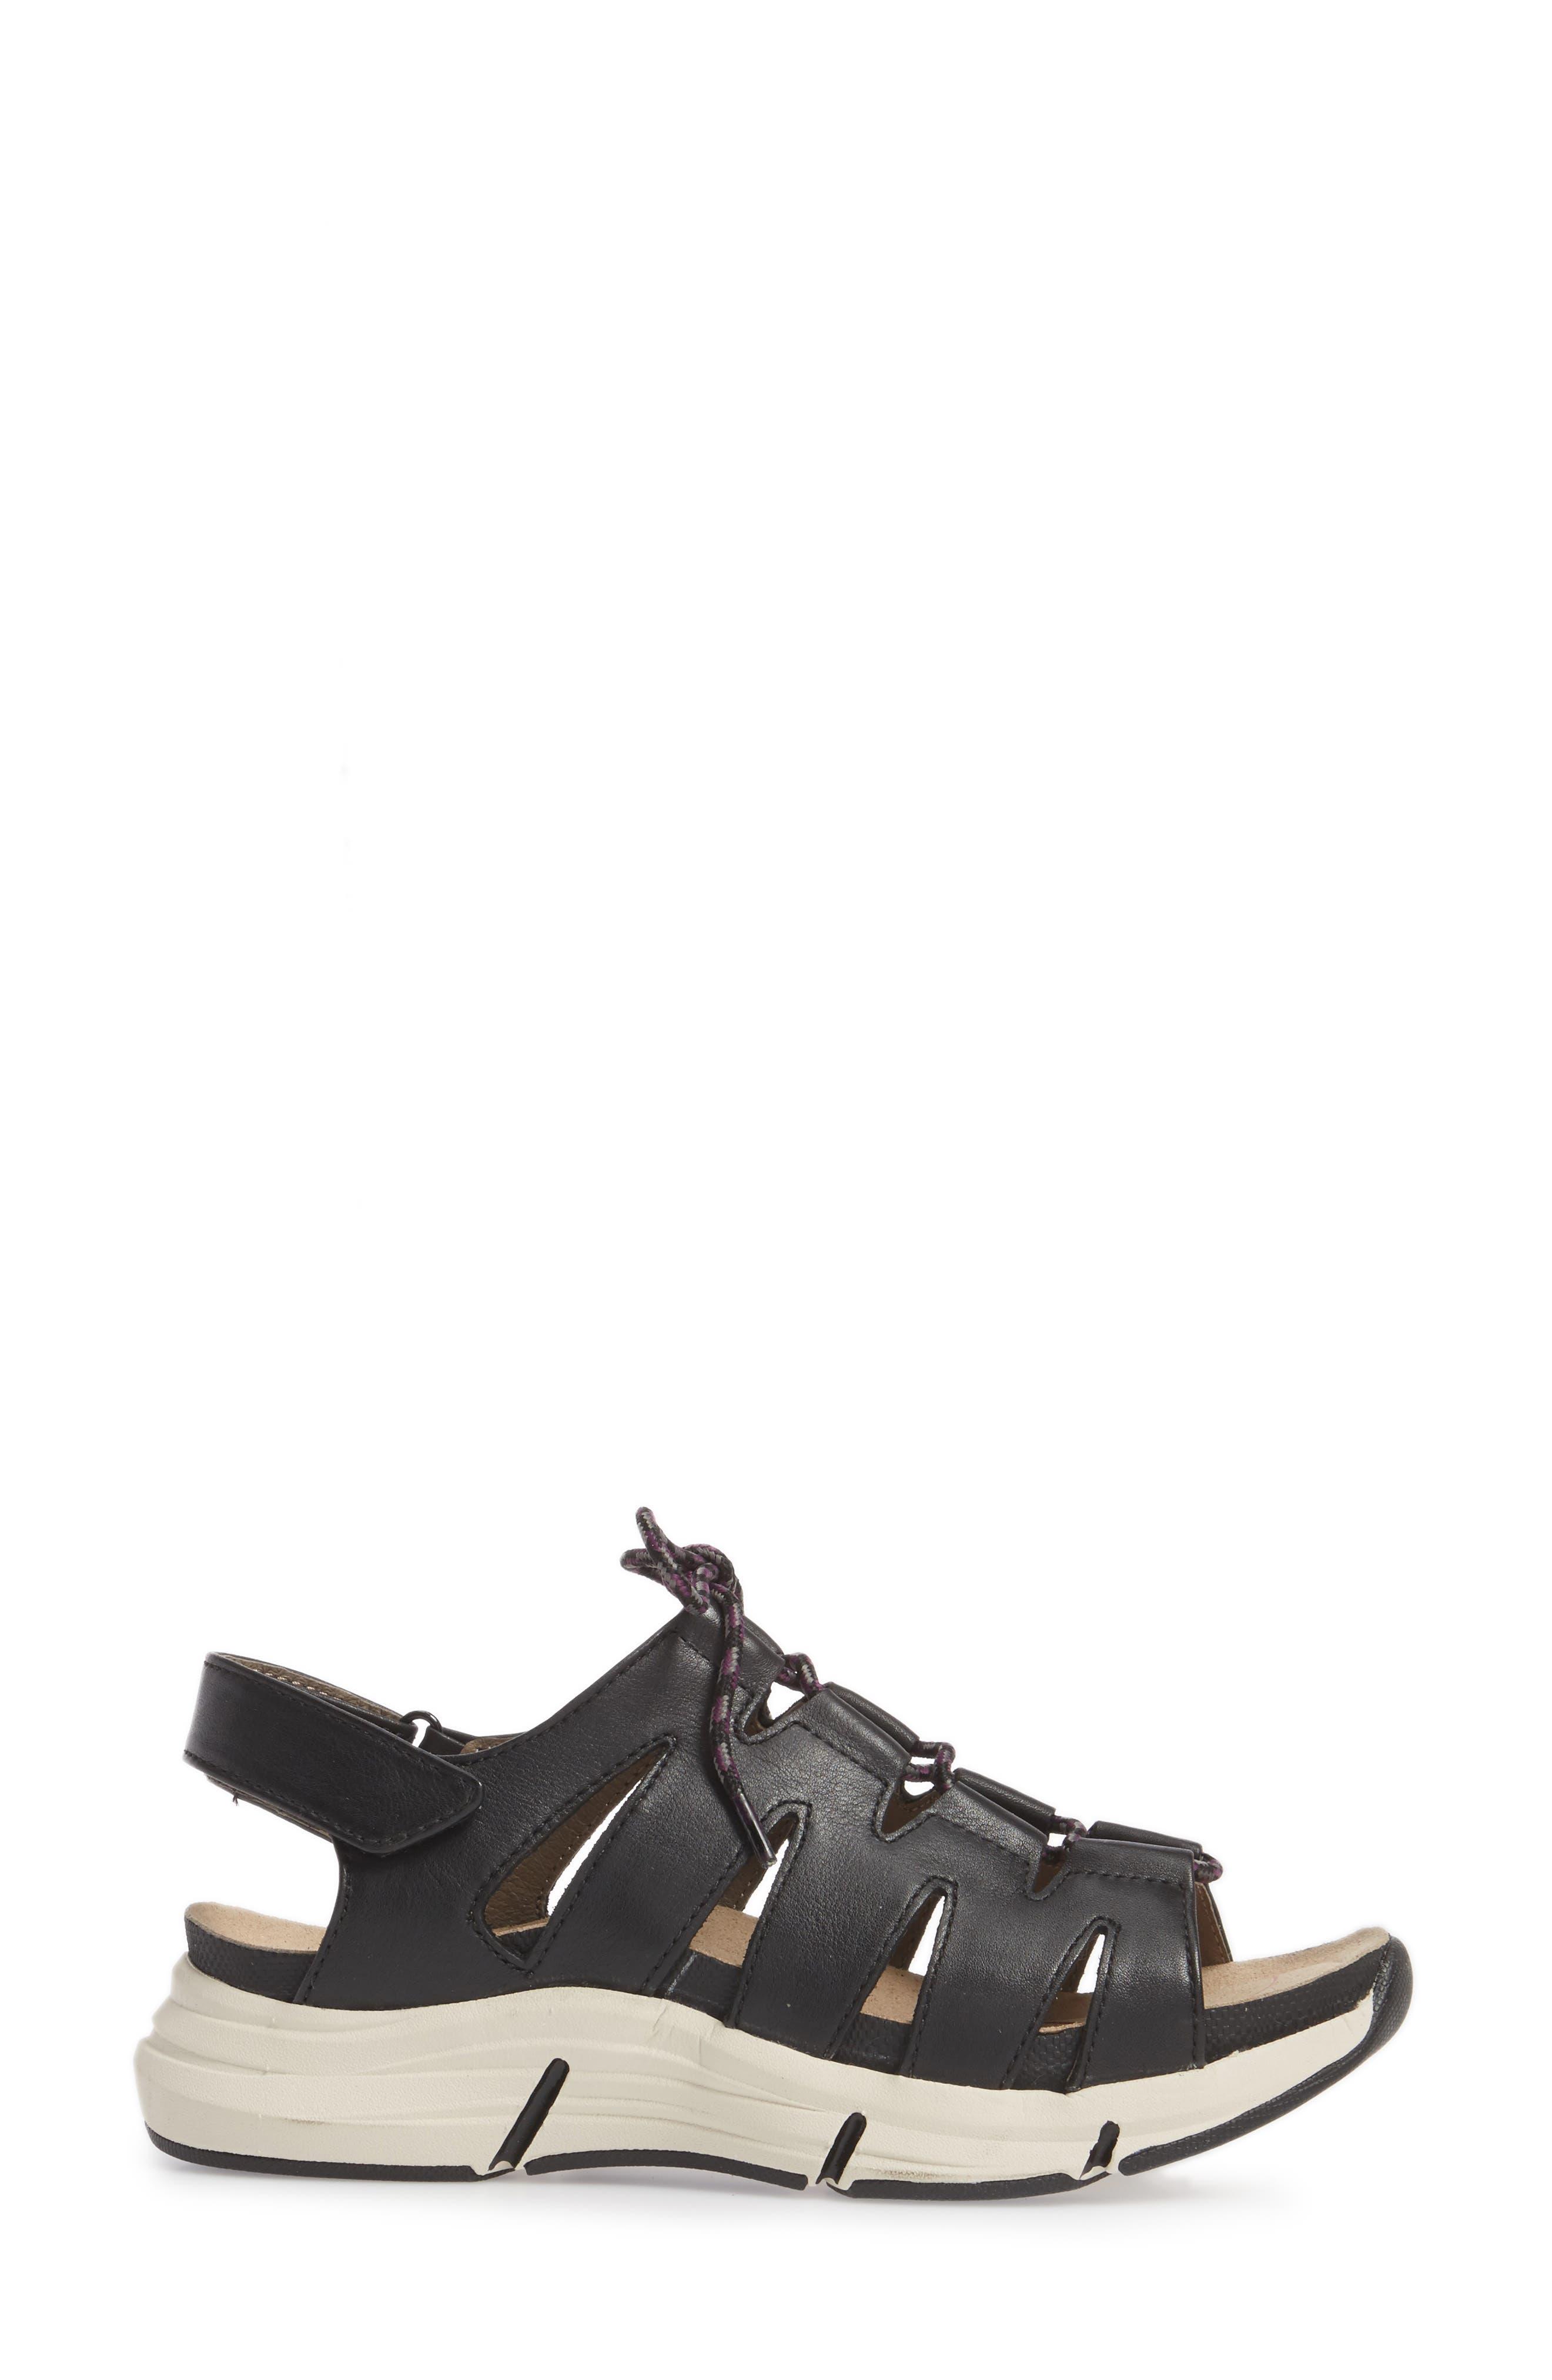 BIONICA,                             Olanda Ghillie Slingback Sandal,                             Alternate thumbnail 3, color,                             BLACK LEATHER